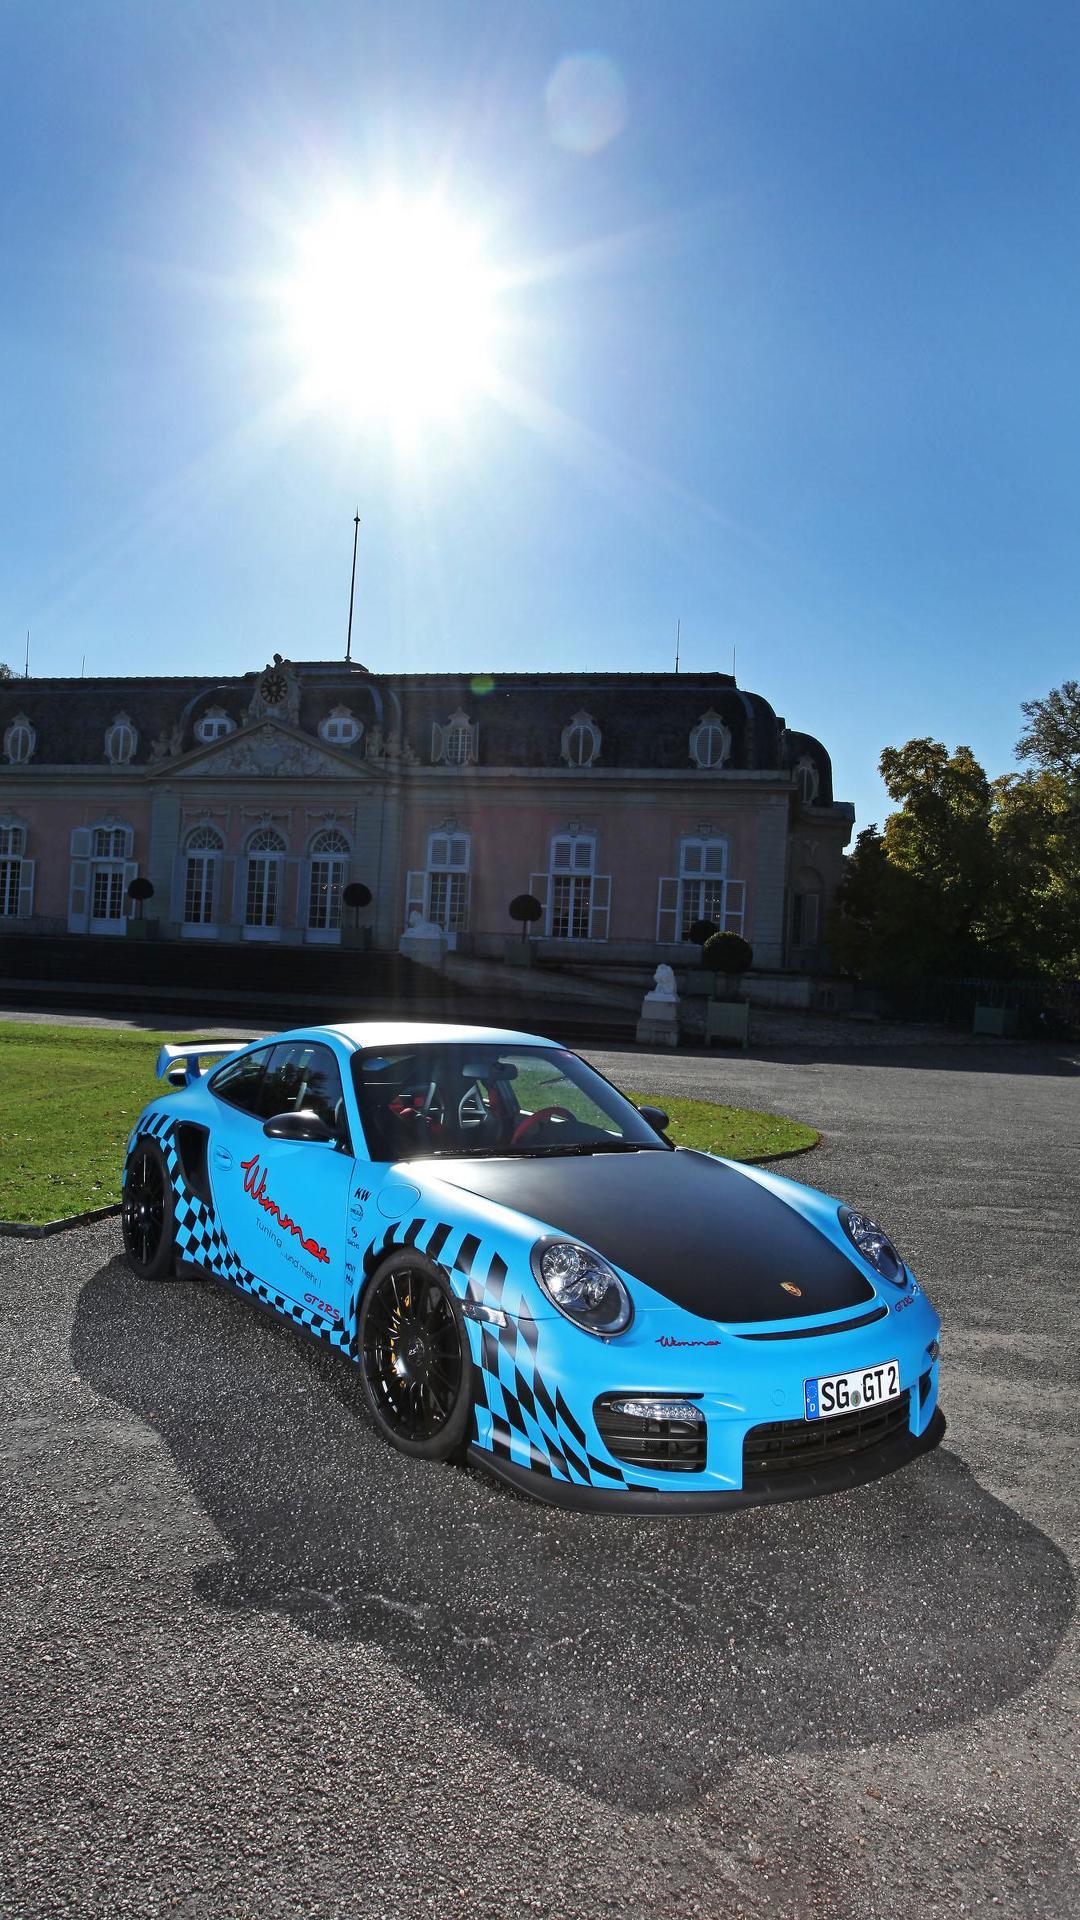 2012-340028-porsche-911-gt2-rs-muscle-play-by-wimmer-rs-23-10-20121 Astounding Porsche 911 Gt2 Rs 2012 Cars Trend